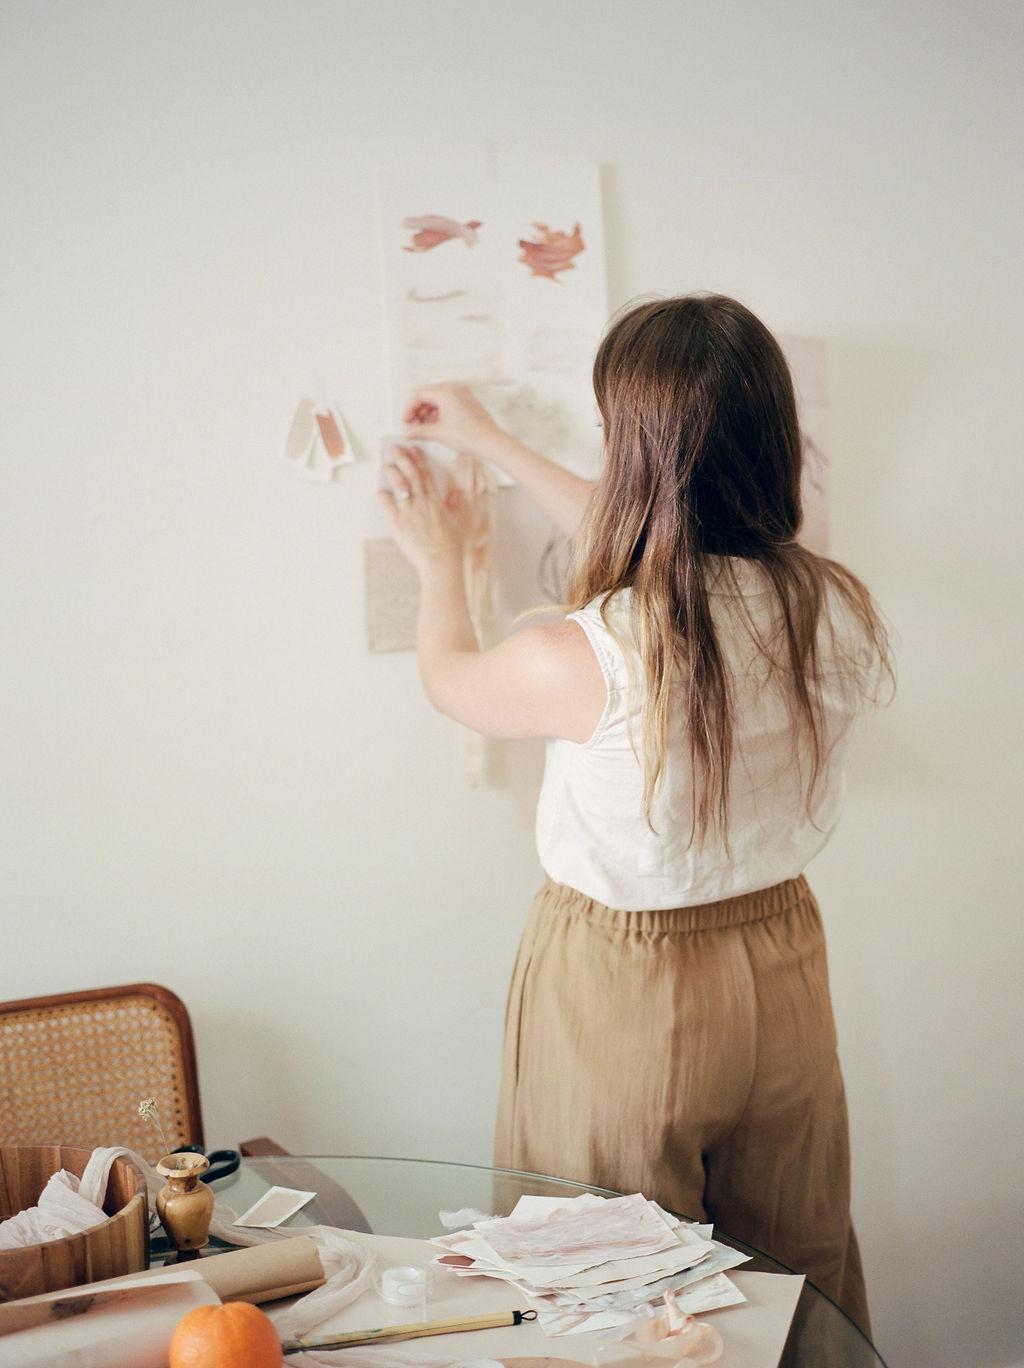 Woman creating a mood board